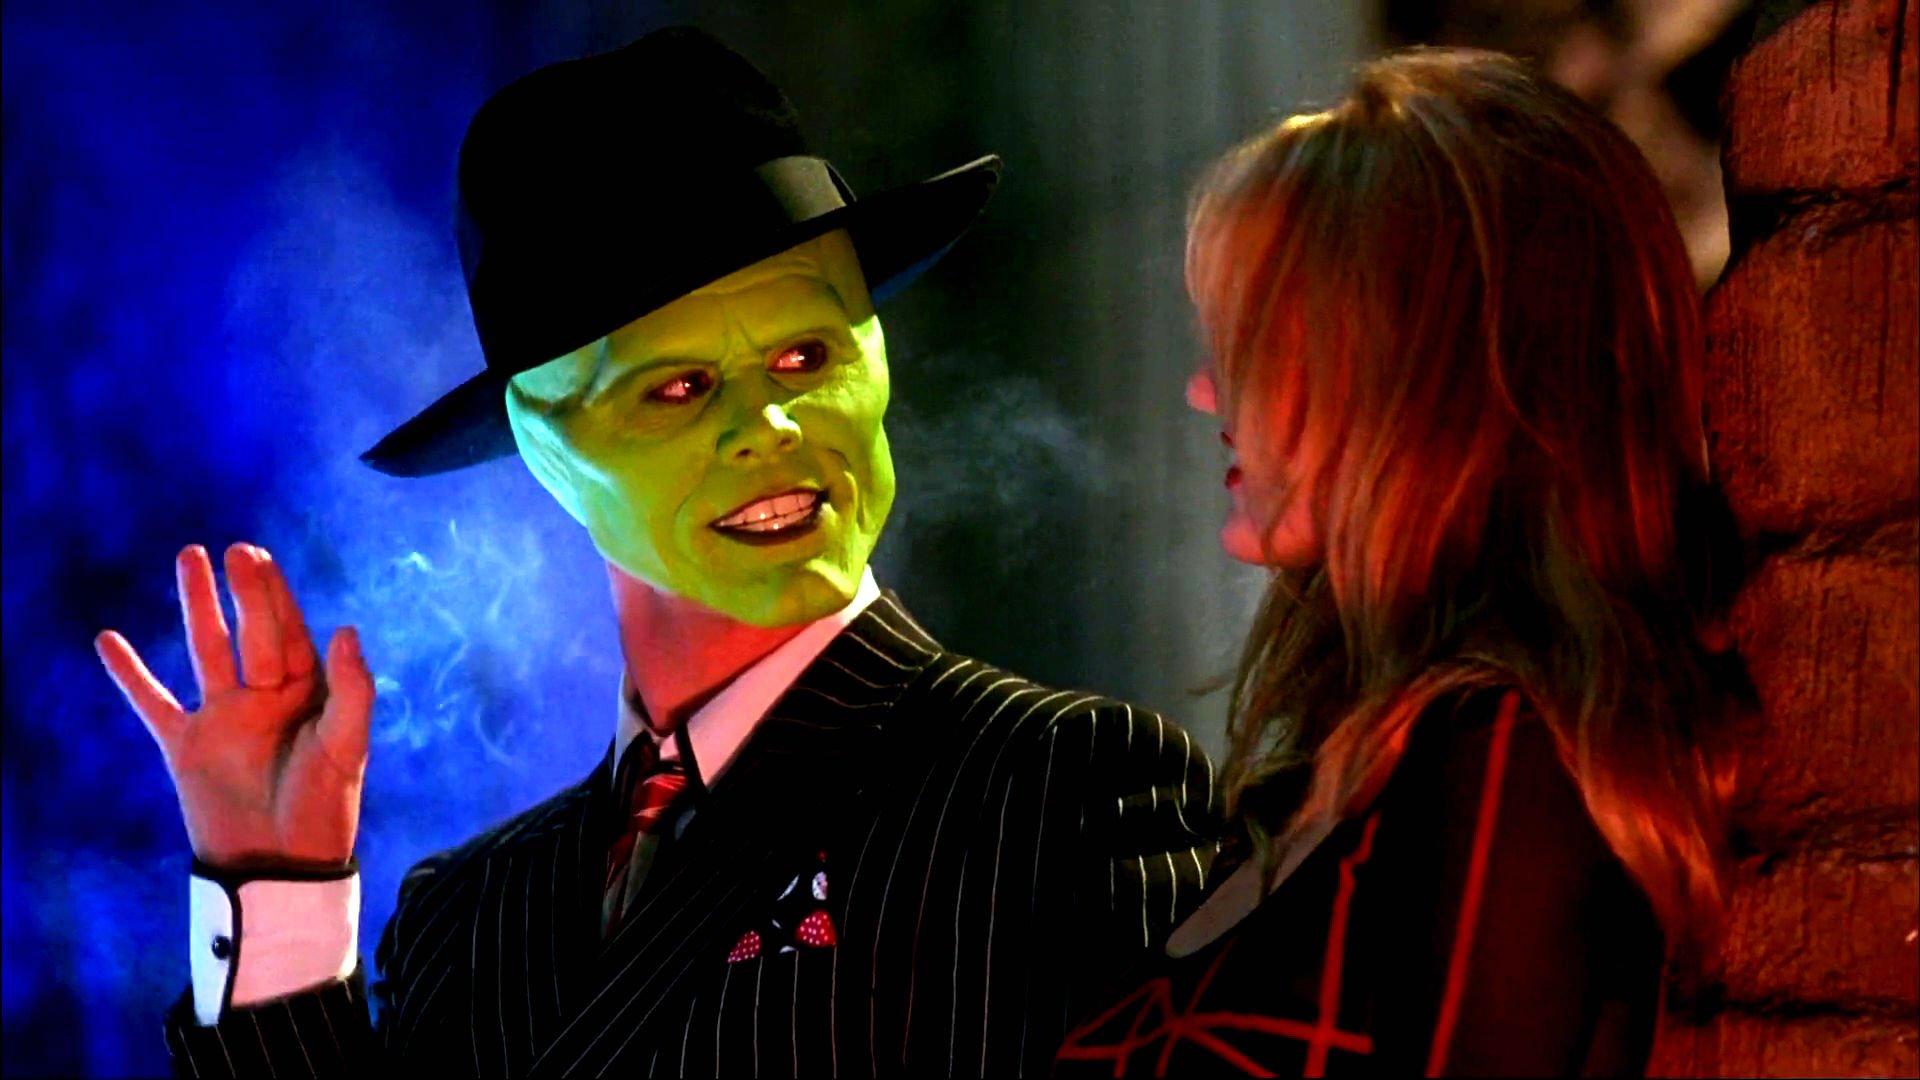 قصةفيلم The Mask